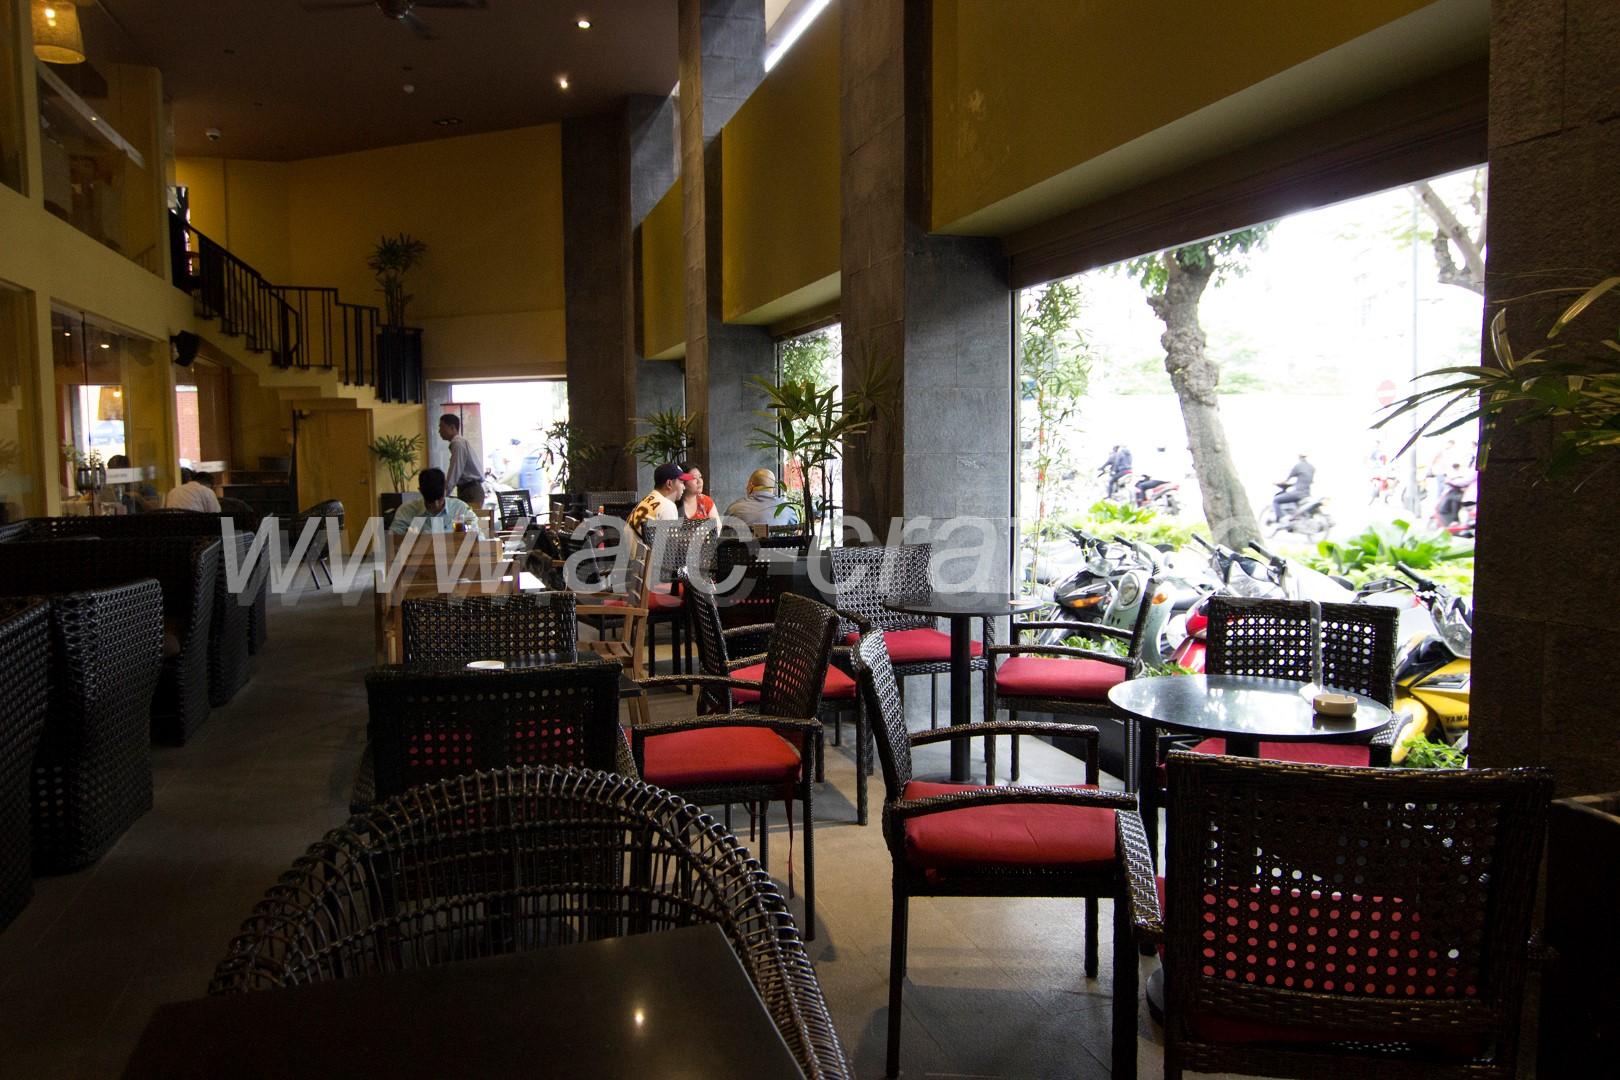 Highlands Coffee indoor area wicker chairs